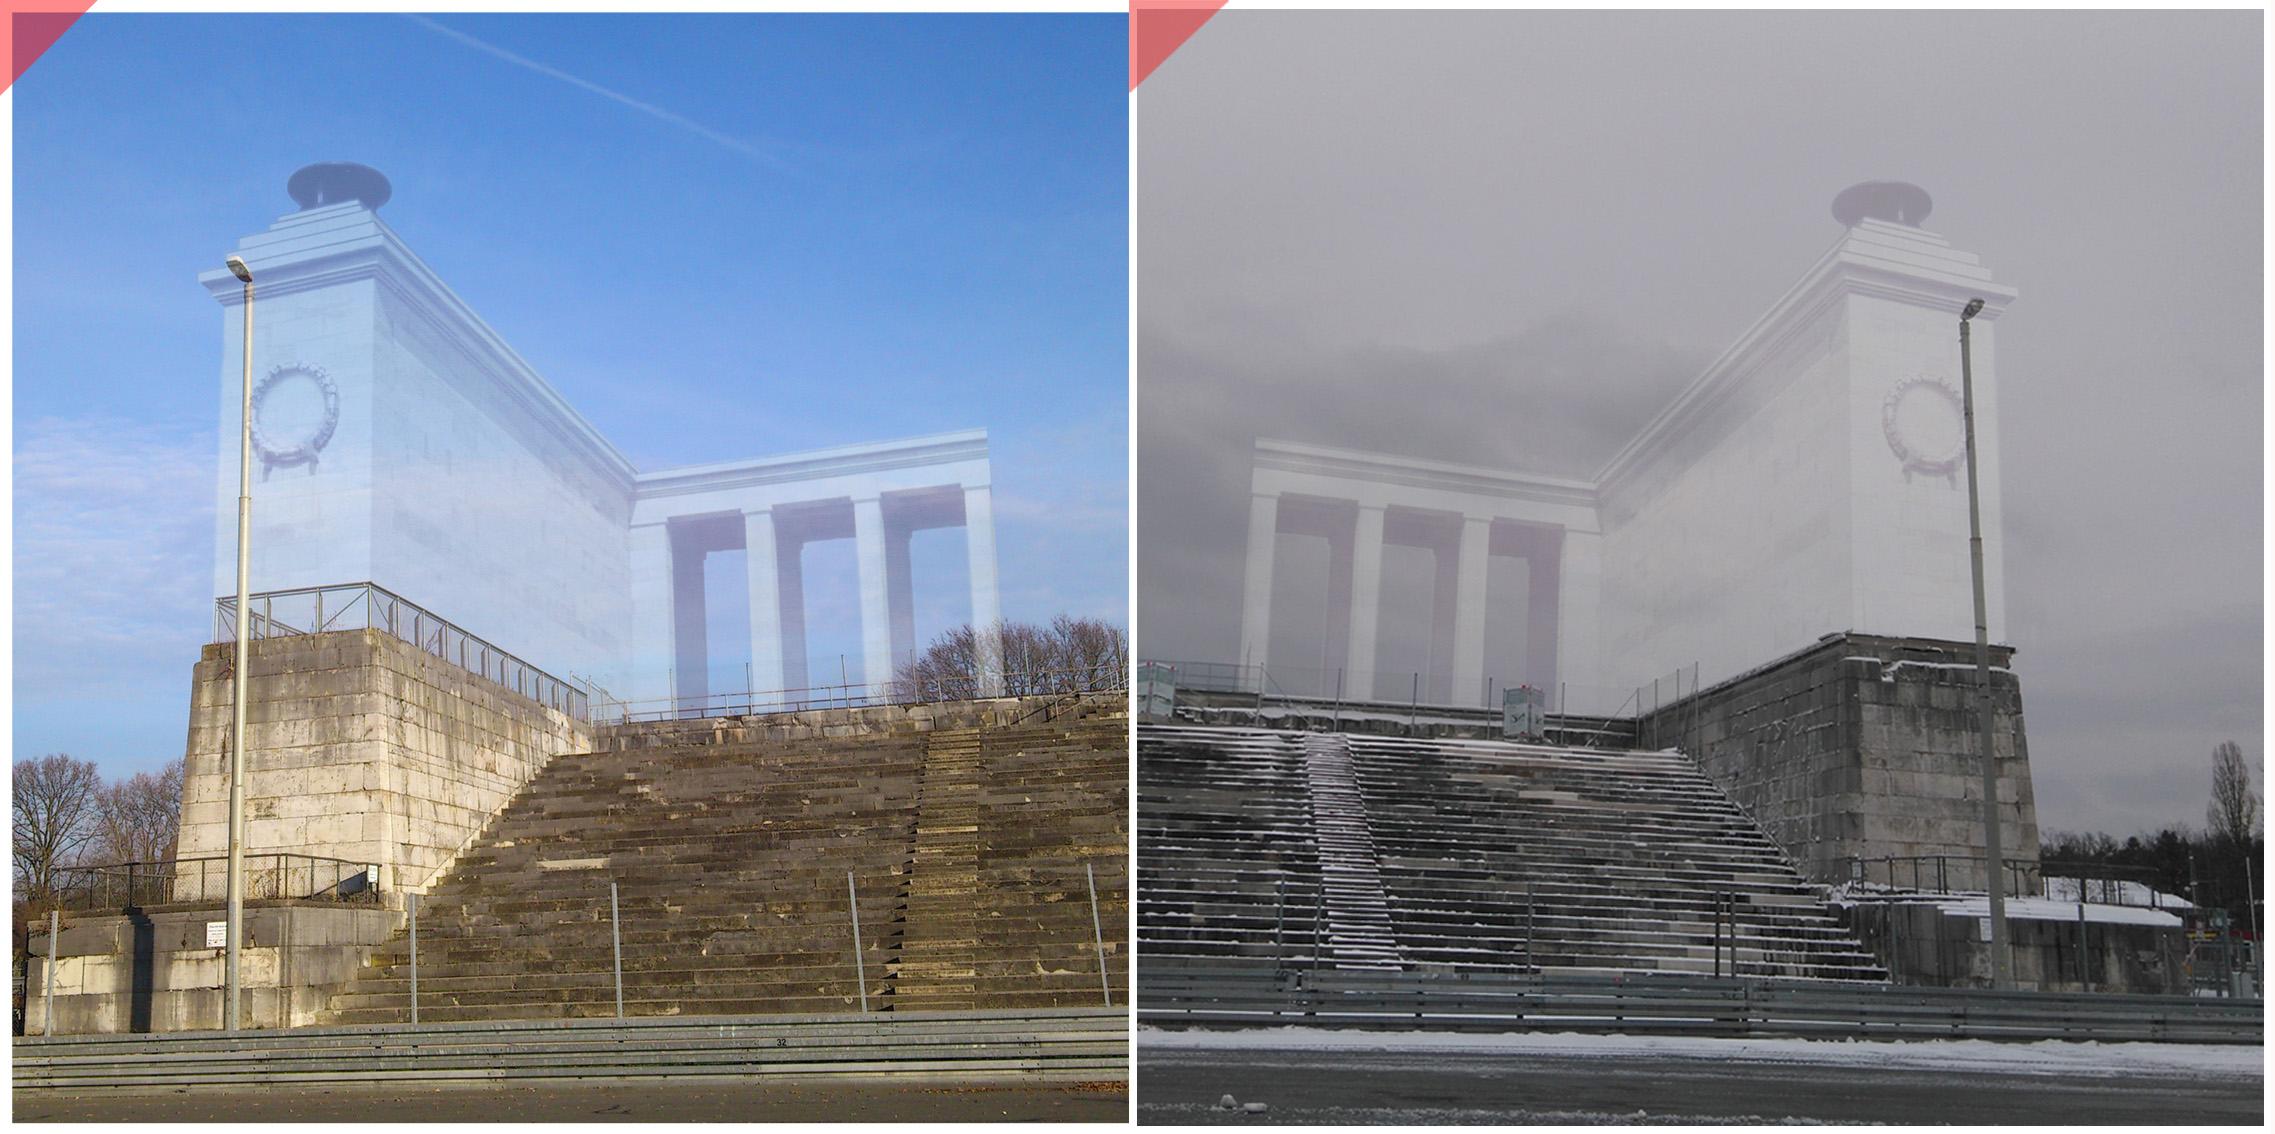 Reichsparteitagsgelände-Nürnberg-Zeppelinfeld-Zeppelintribüne-Säulen-Kolonnaden-1967 gesprengt-Eckbauten-Damals-jetzt-Überblenden-Nazi-Party-Rally-Grounds-Zeppelin-field-grandstand-columns-facade-conservation-Then-Now